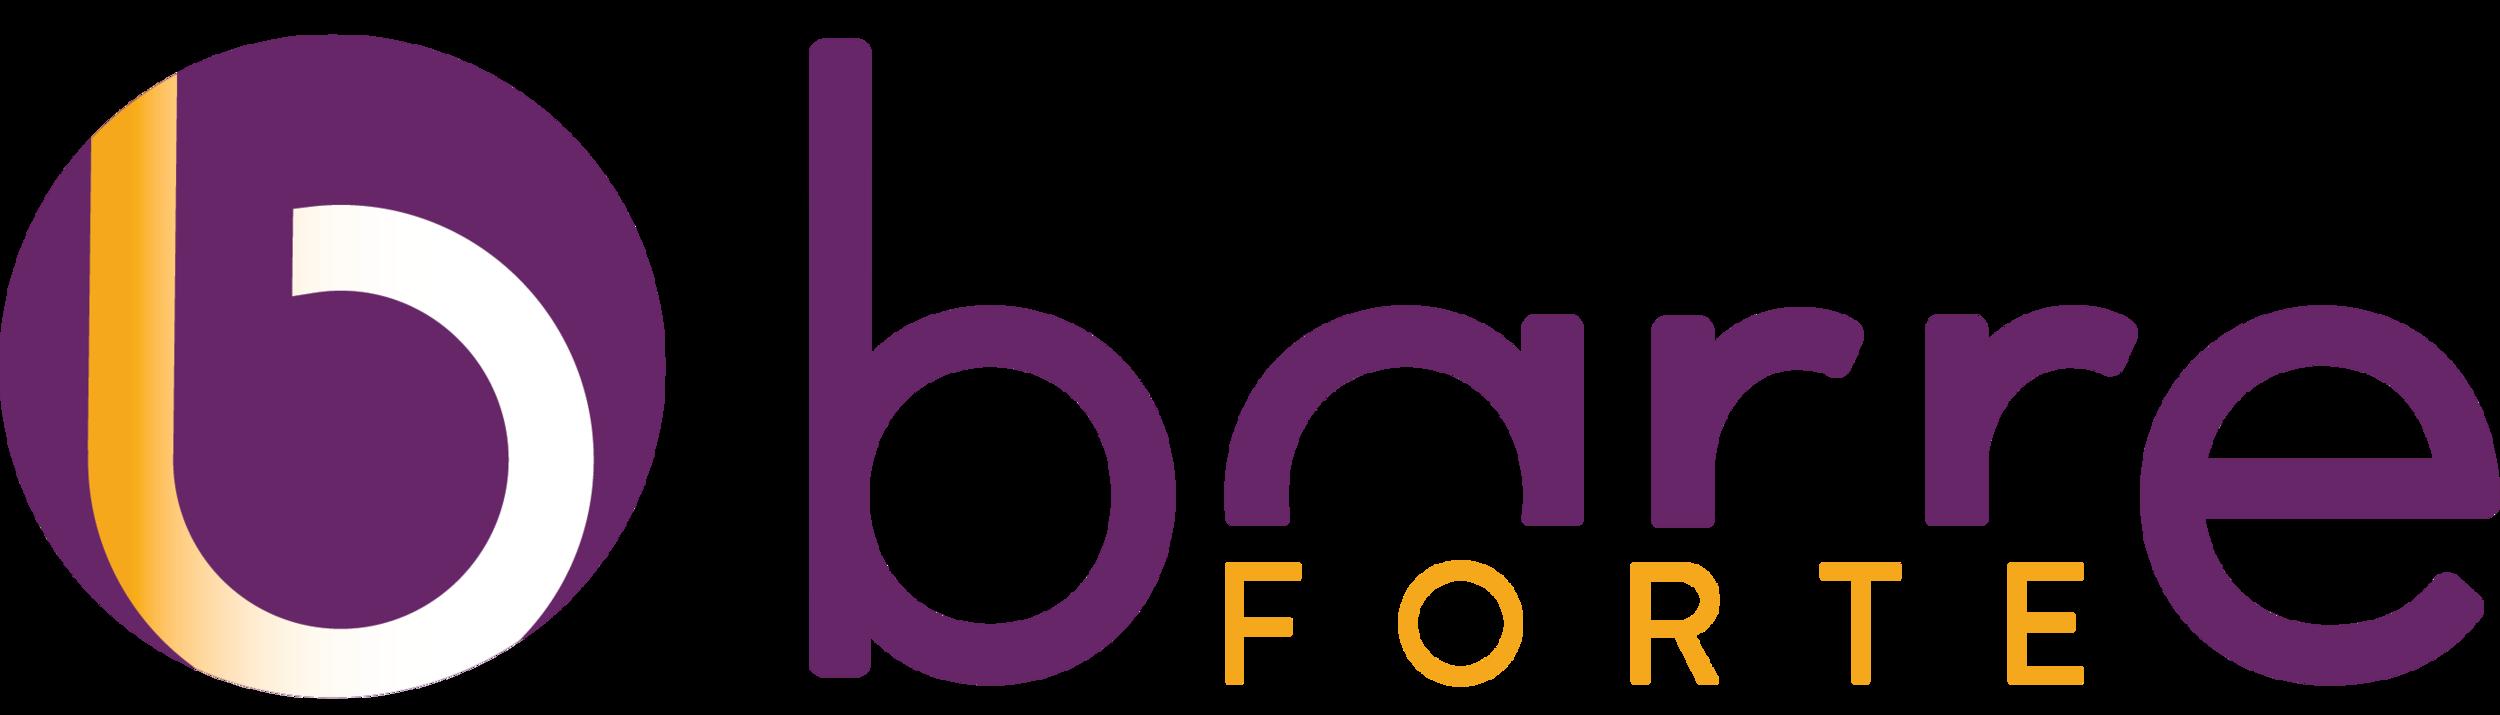 Barre Forte Logo Board.png